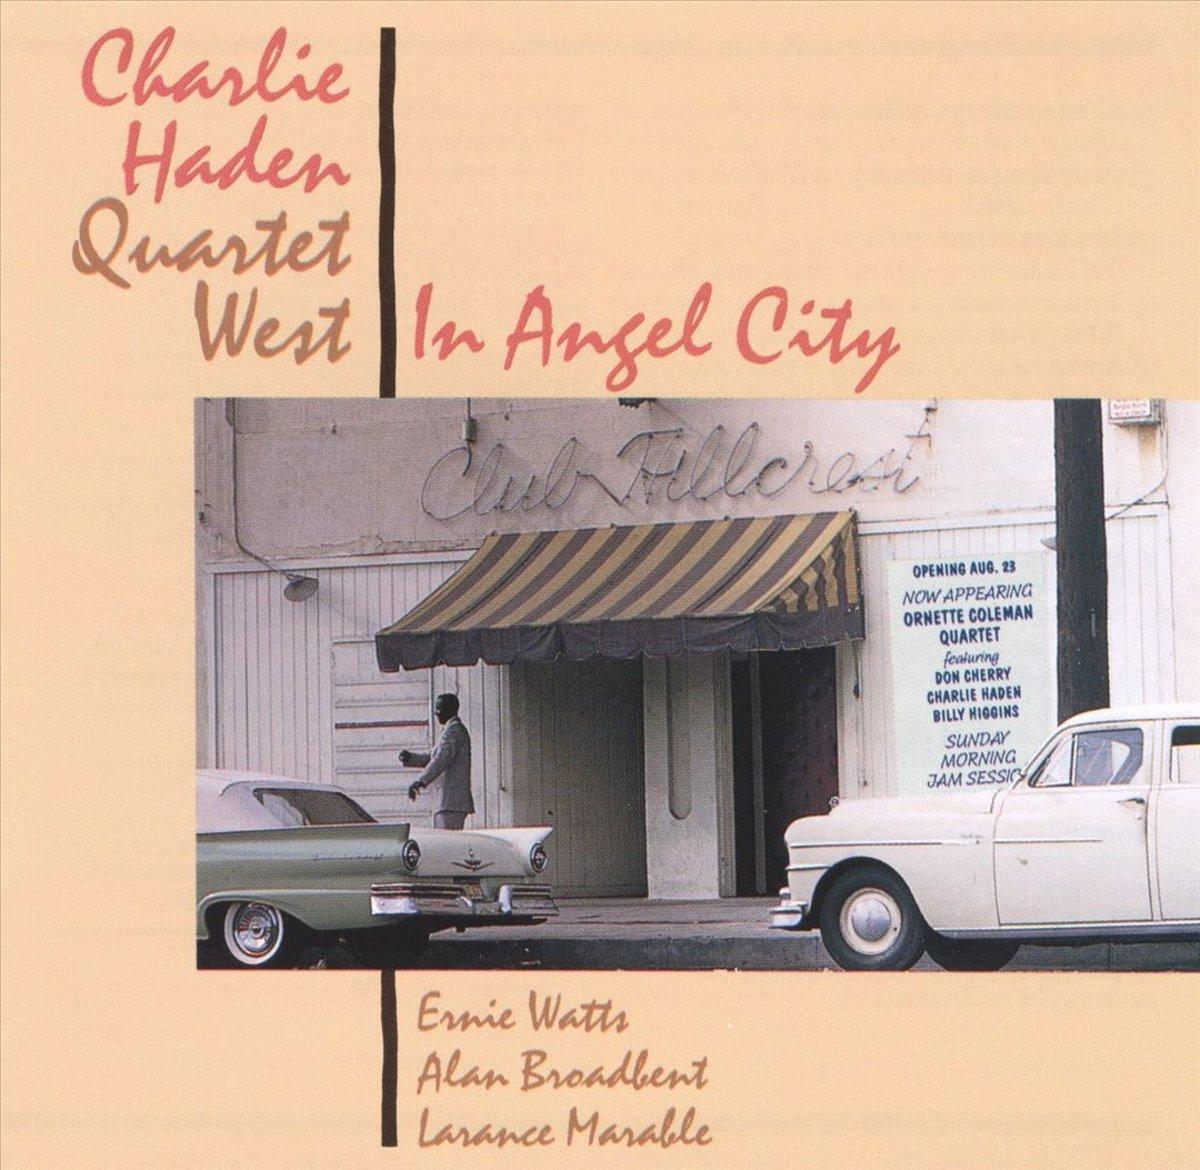 Charlie Haden Quarte. Angel City angel city